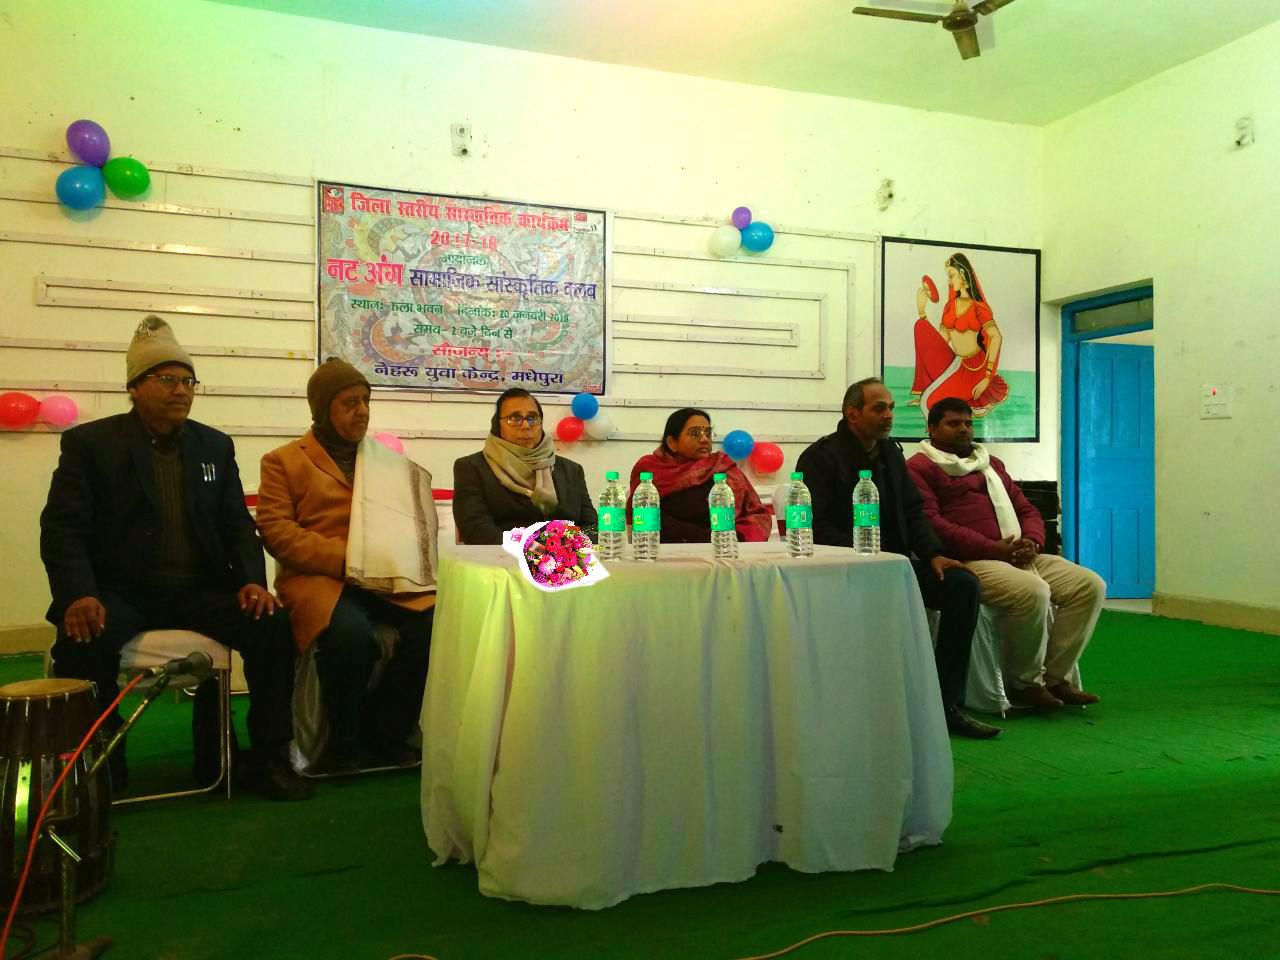 Dr.Madhepuri with Zila Parishad President Smt.Manju Devi, Prof.S.K.Yadav , Dr.Vinay Kumar Choudhary , NYC Co-ordinator Shri Ajay Kumar Gupta & Social Activist Rahul Kumar.